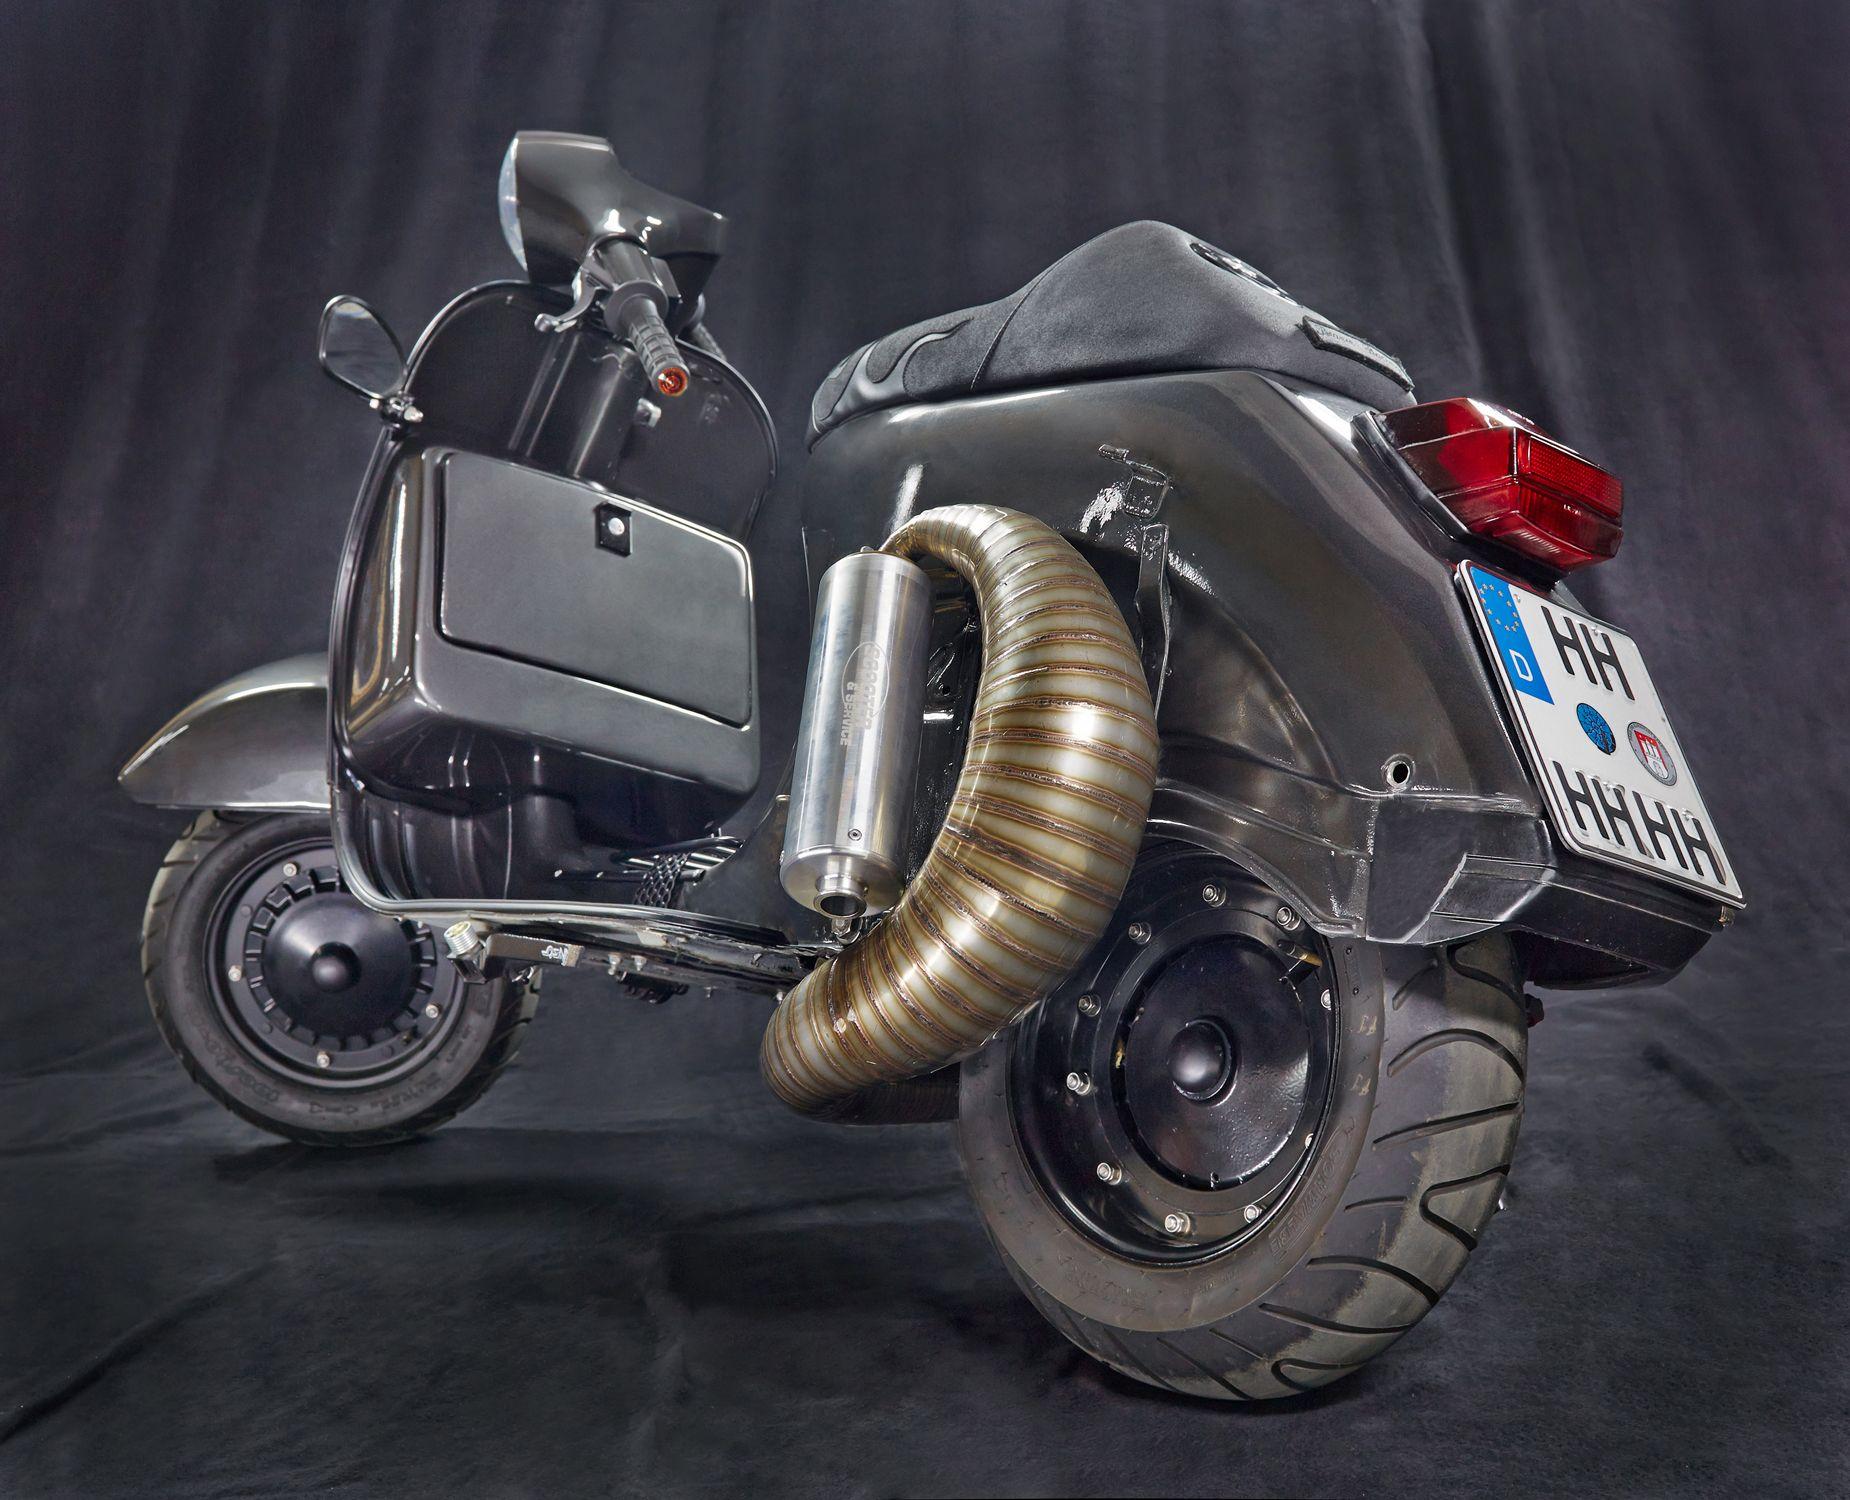 Custom Vespa PX 200 Bemerkenswerter Vespa PX 200 Umbau mit ...